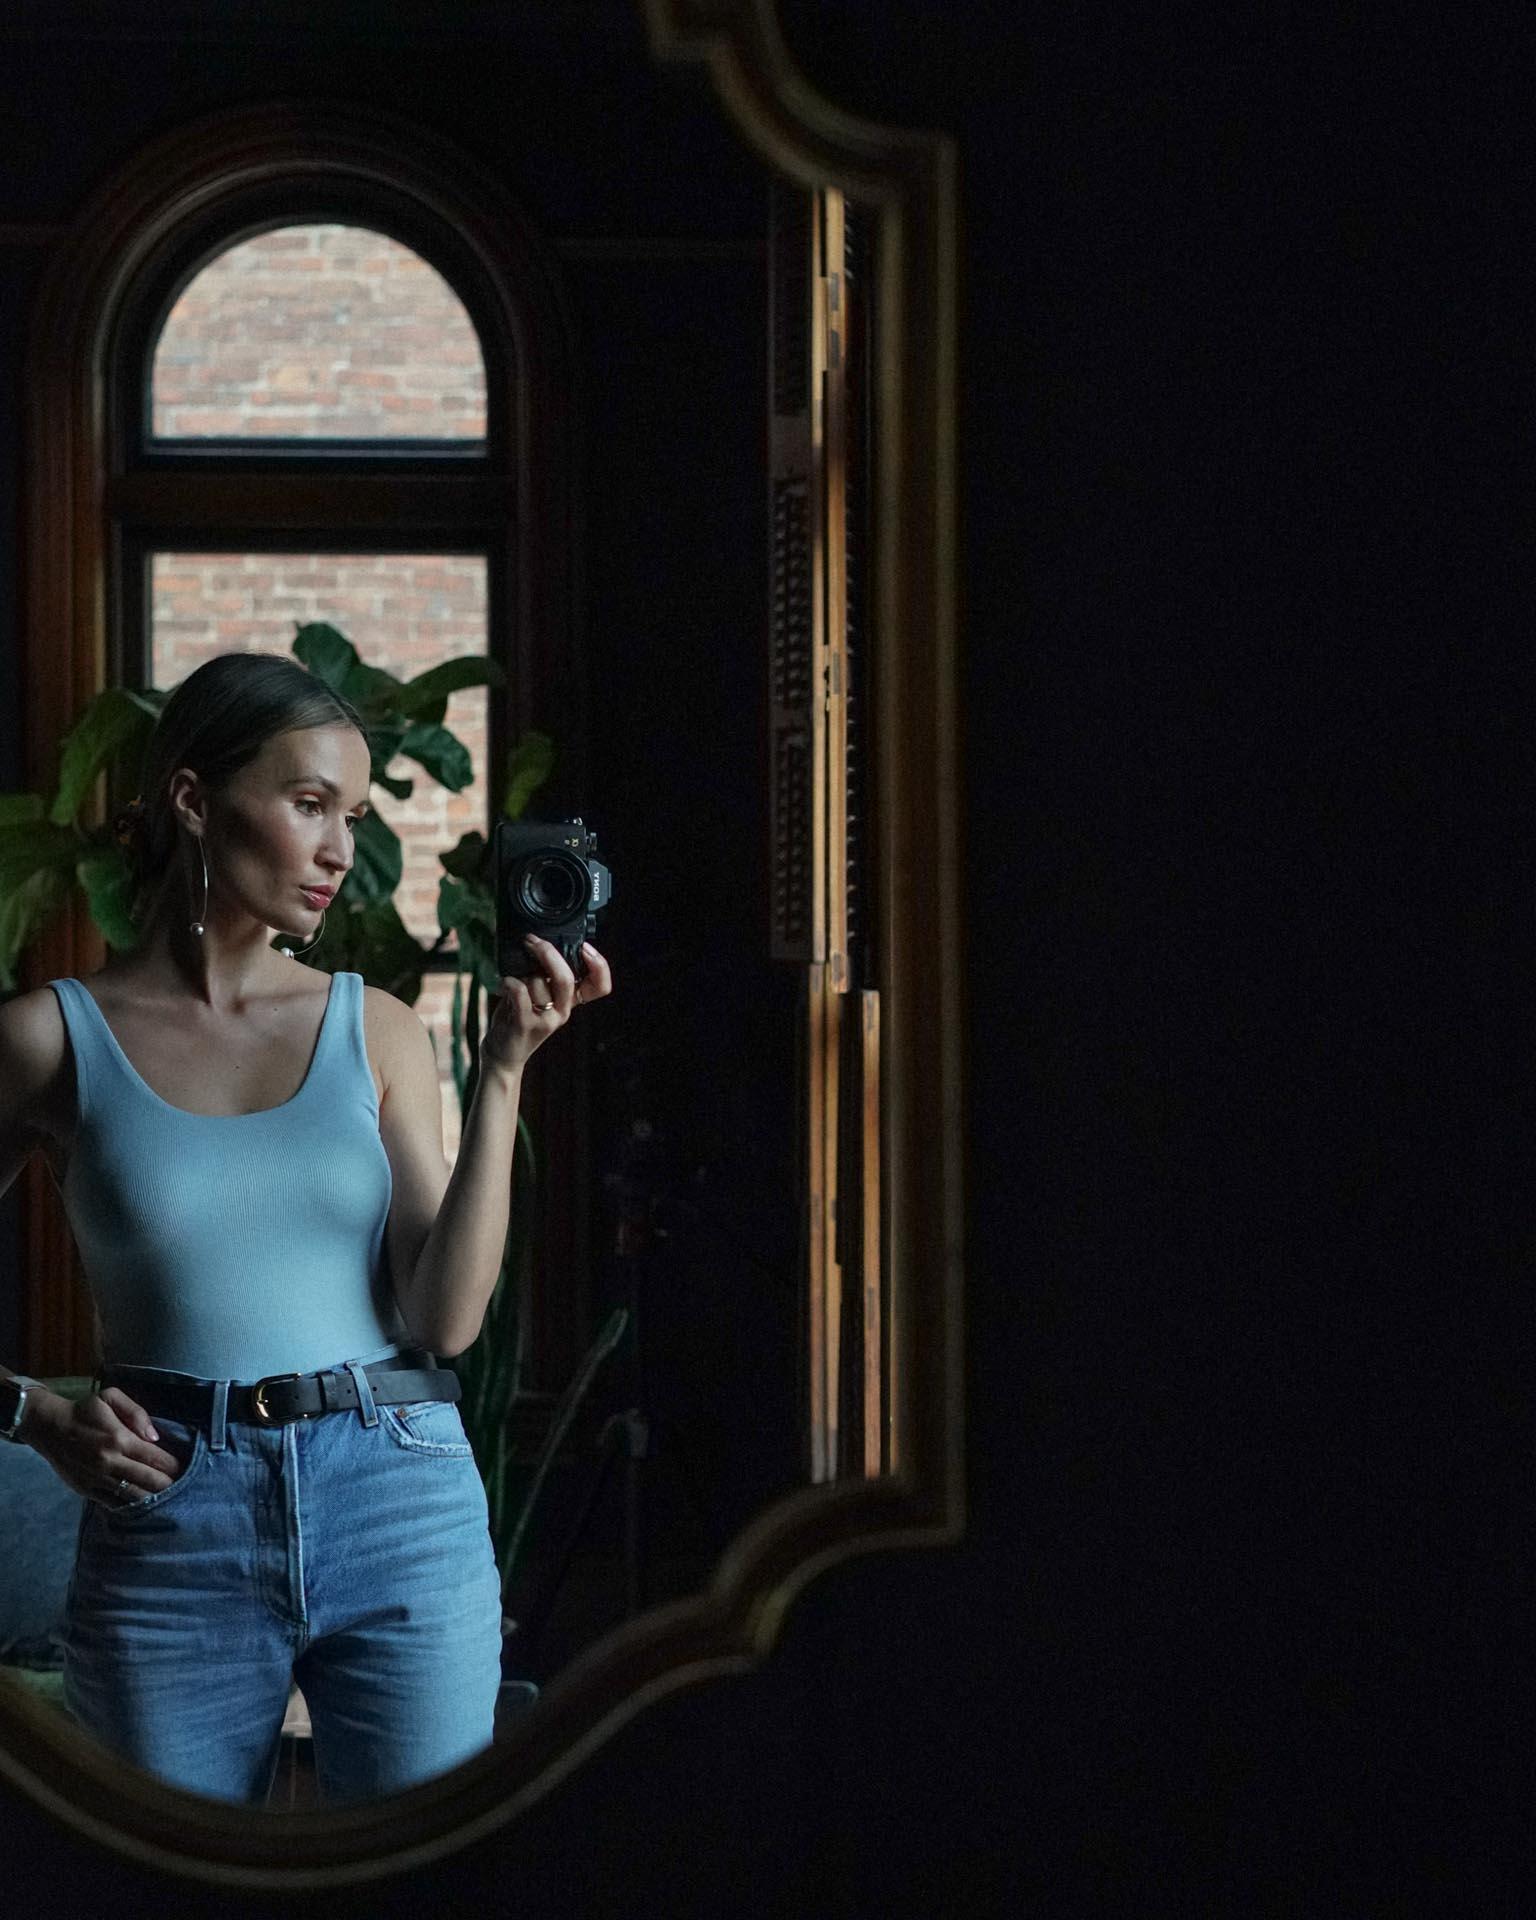 in this photo I'm wearing - earrings Dinosaur Designsbodysuit Aritziabelt H&M jeans AGOLDE